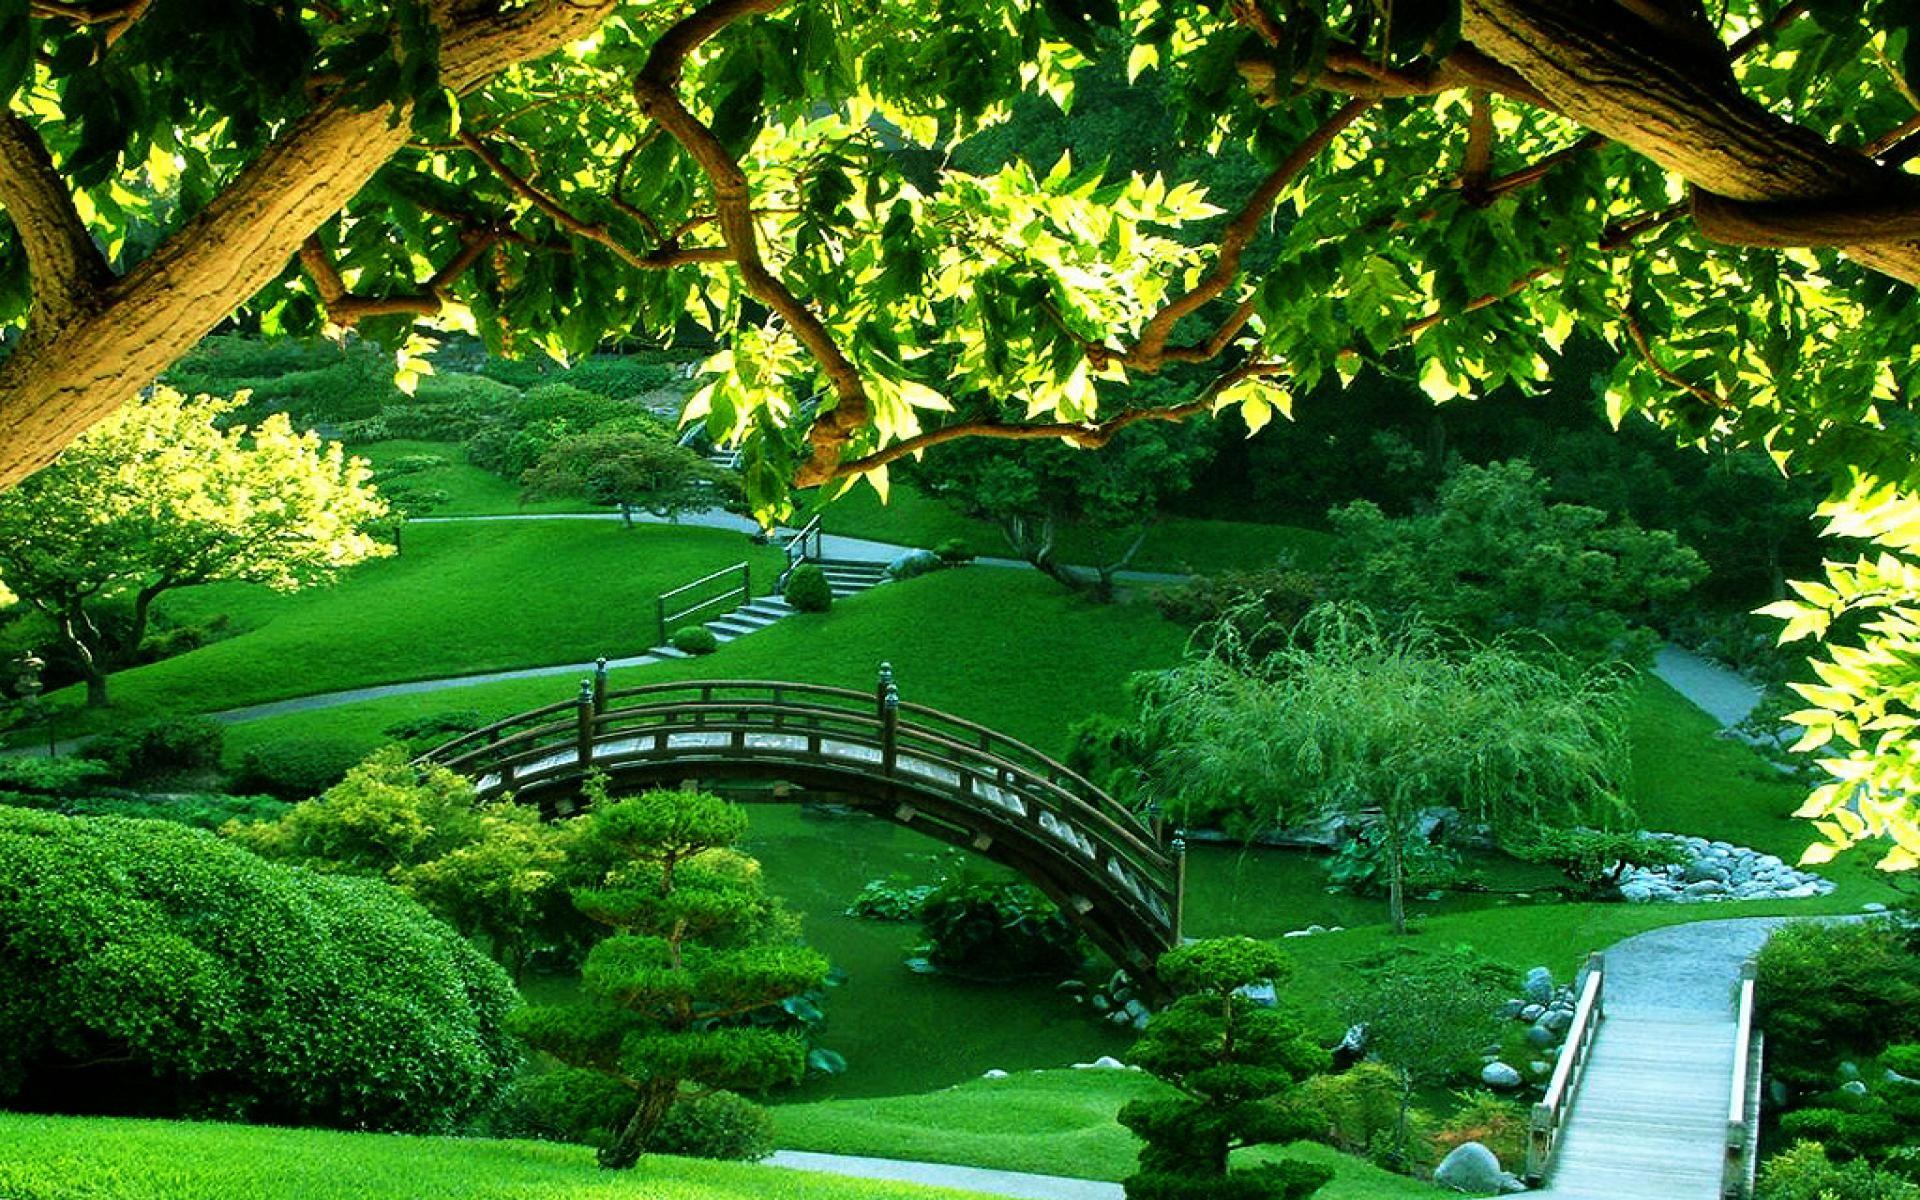 Japanese Garden at Huntington Library and Botanical Gardens in San Marino,  Ca.